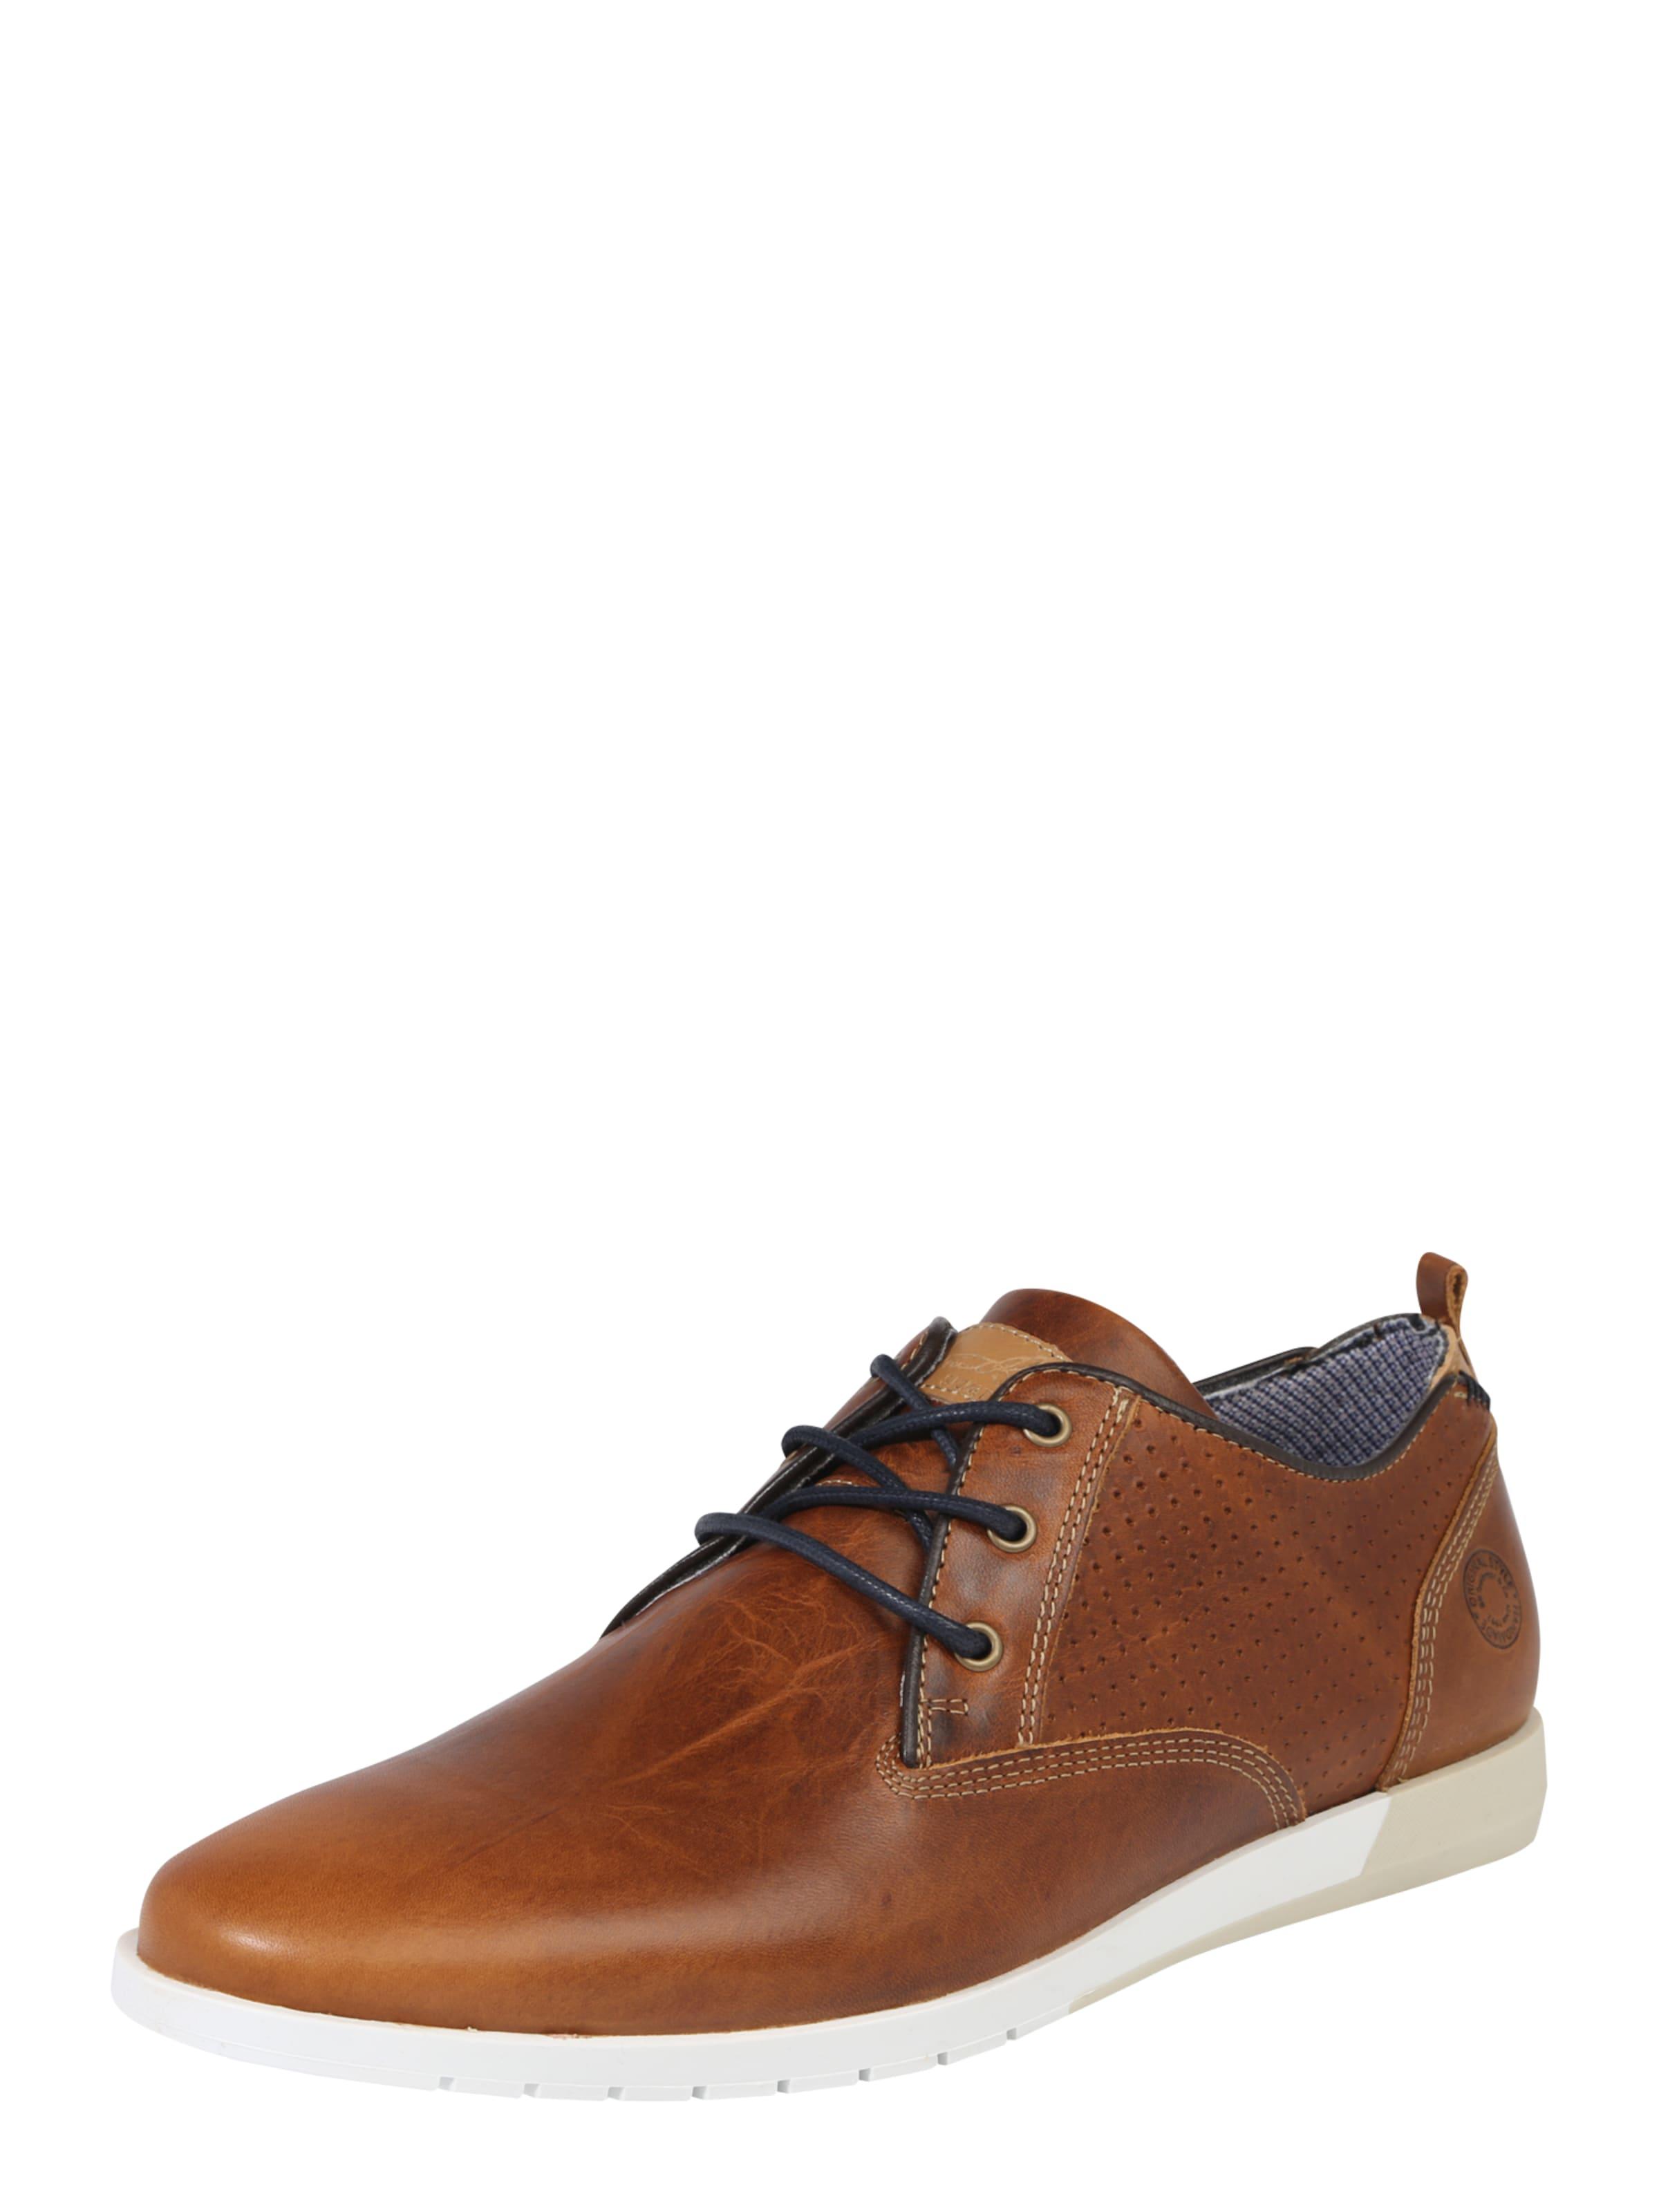 Haltbare Struktur-Leder Mode billige Schuhe BULLBOXER | Schnürschuhe aus Struktur-Leder Haltbare Schuhe Gut getragene Schuhe cf1b0f